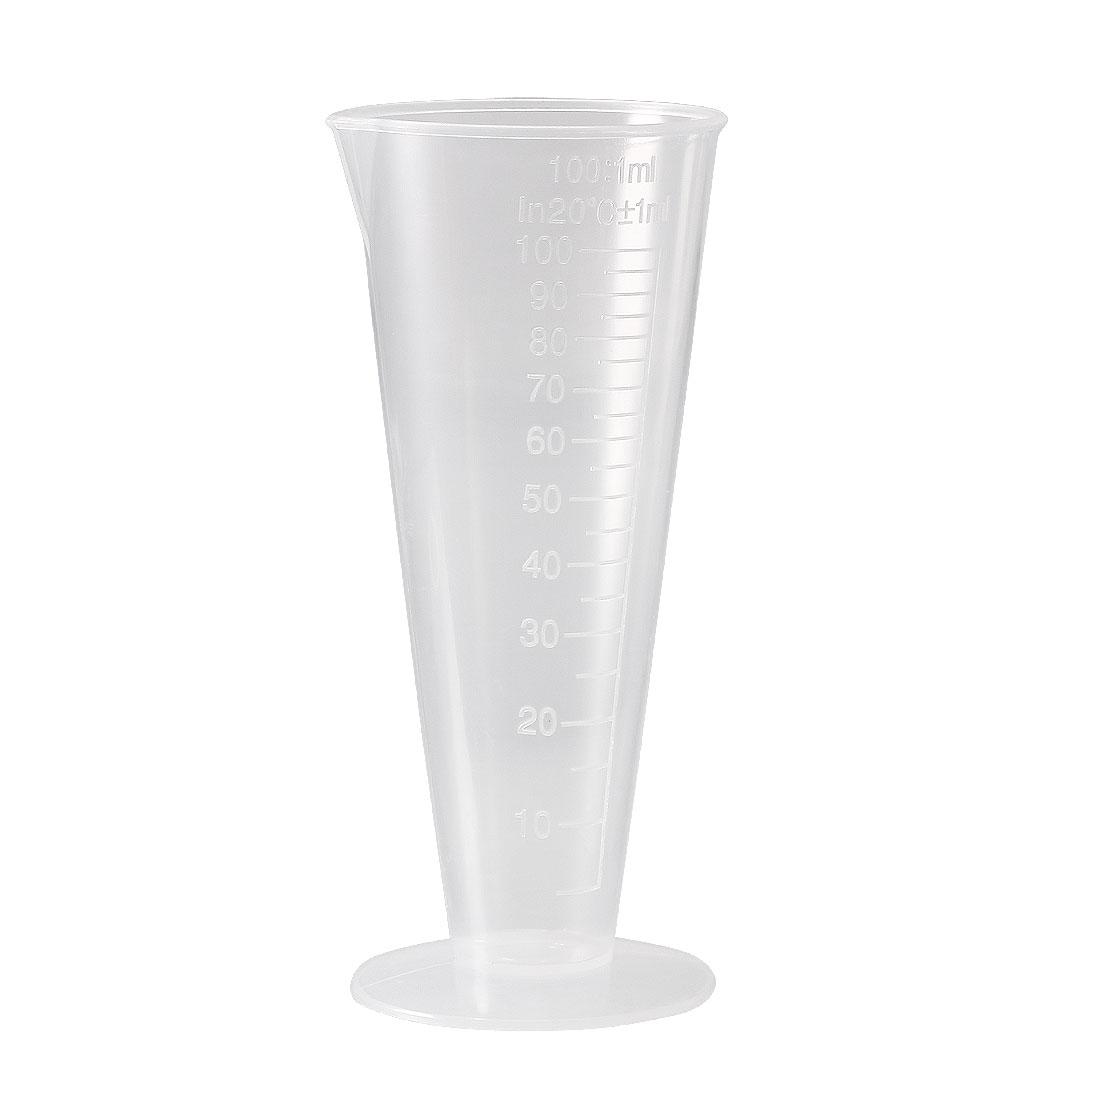 Kitchen Laboratory Plastic Measurement Beaker Measuring Cup 100ml